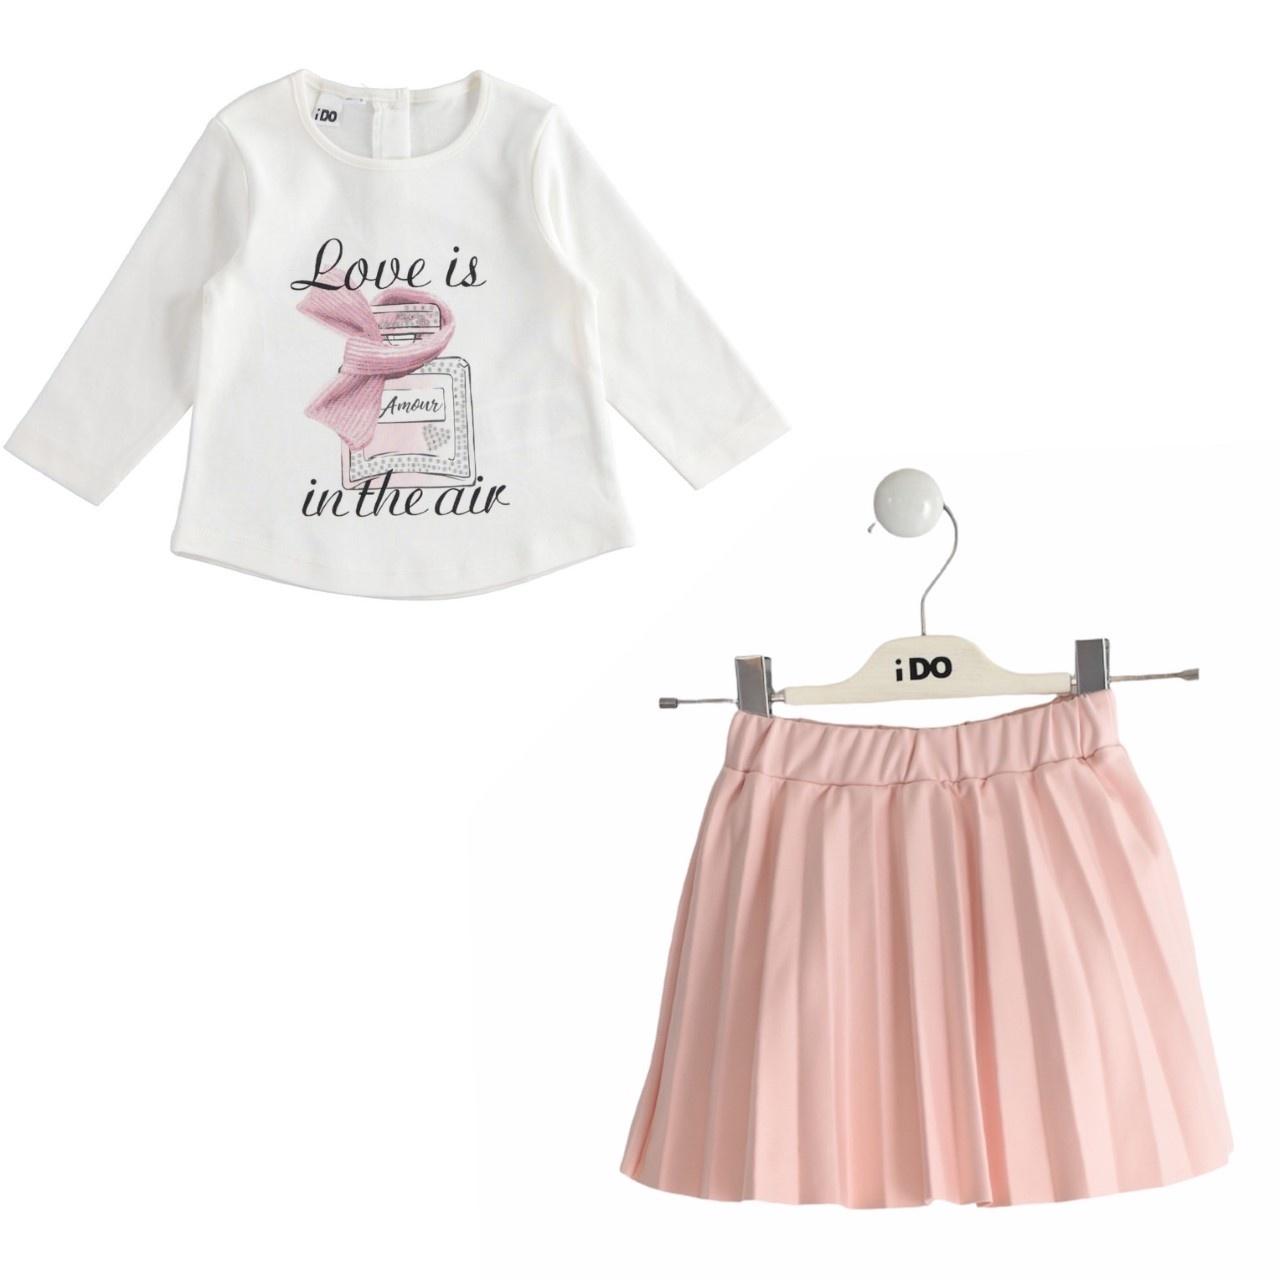 Ido iDO Girls Skirt Set - 43634 AW21